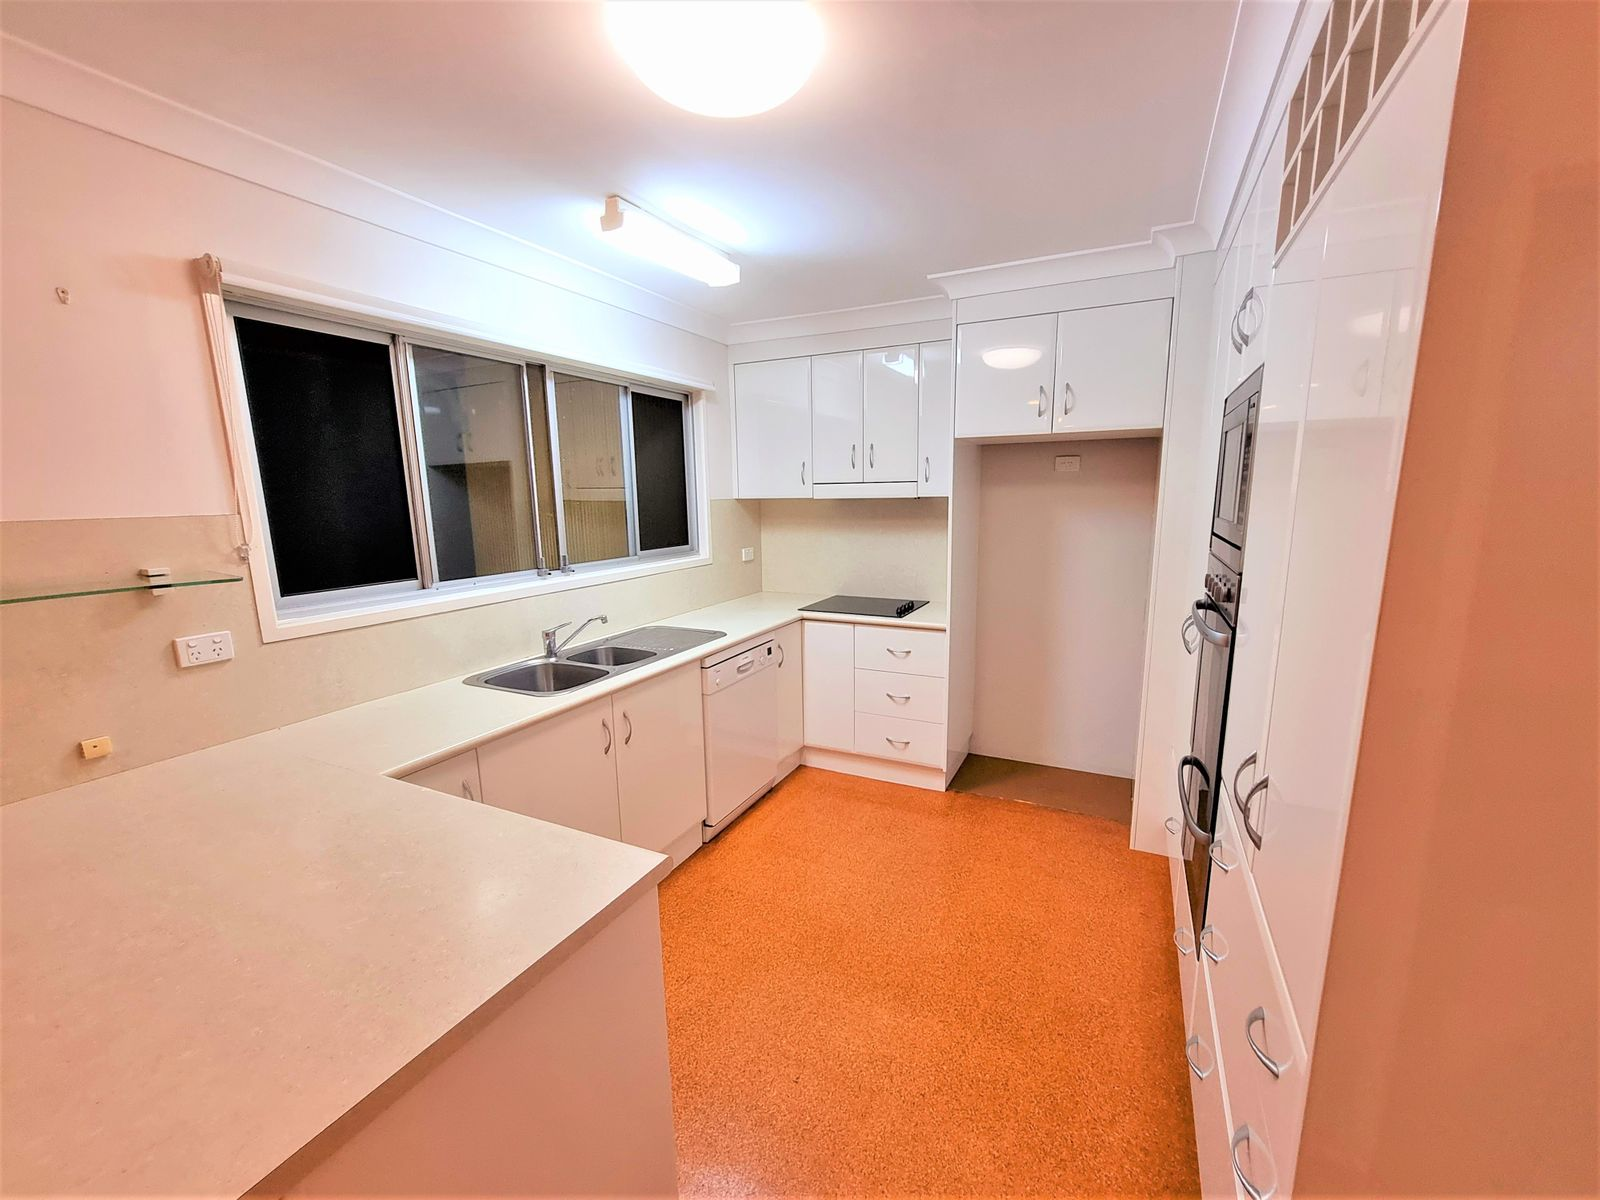 67 Spencer Street, The Range, QLD 4700